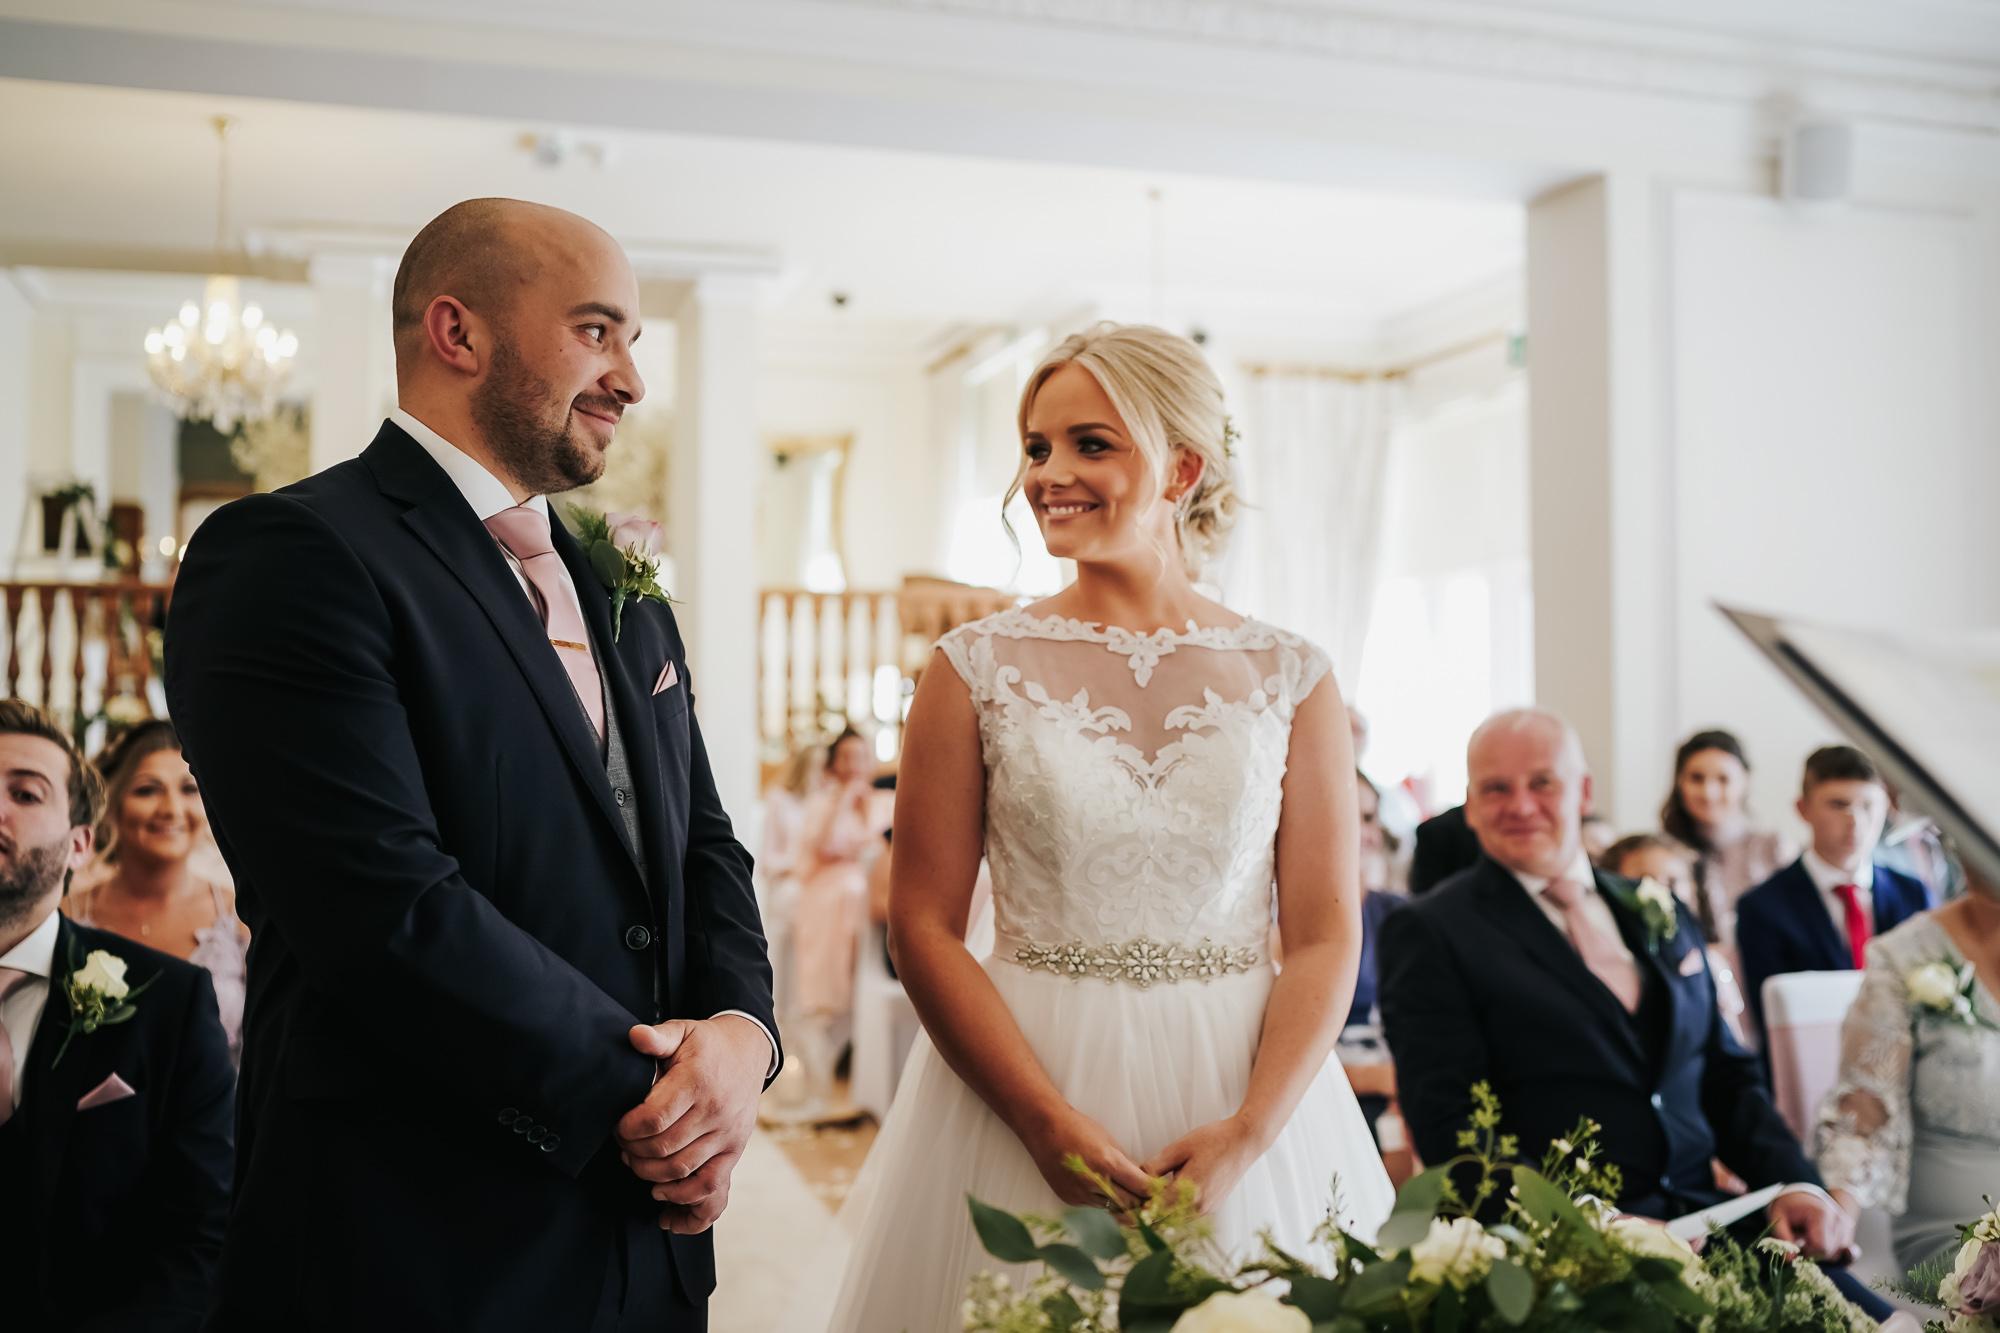 West Tower Wedding Photographer Ormskirk Lancashire wedding photography (23 of 57).jpg